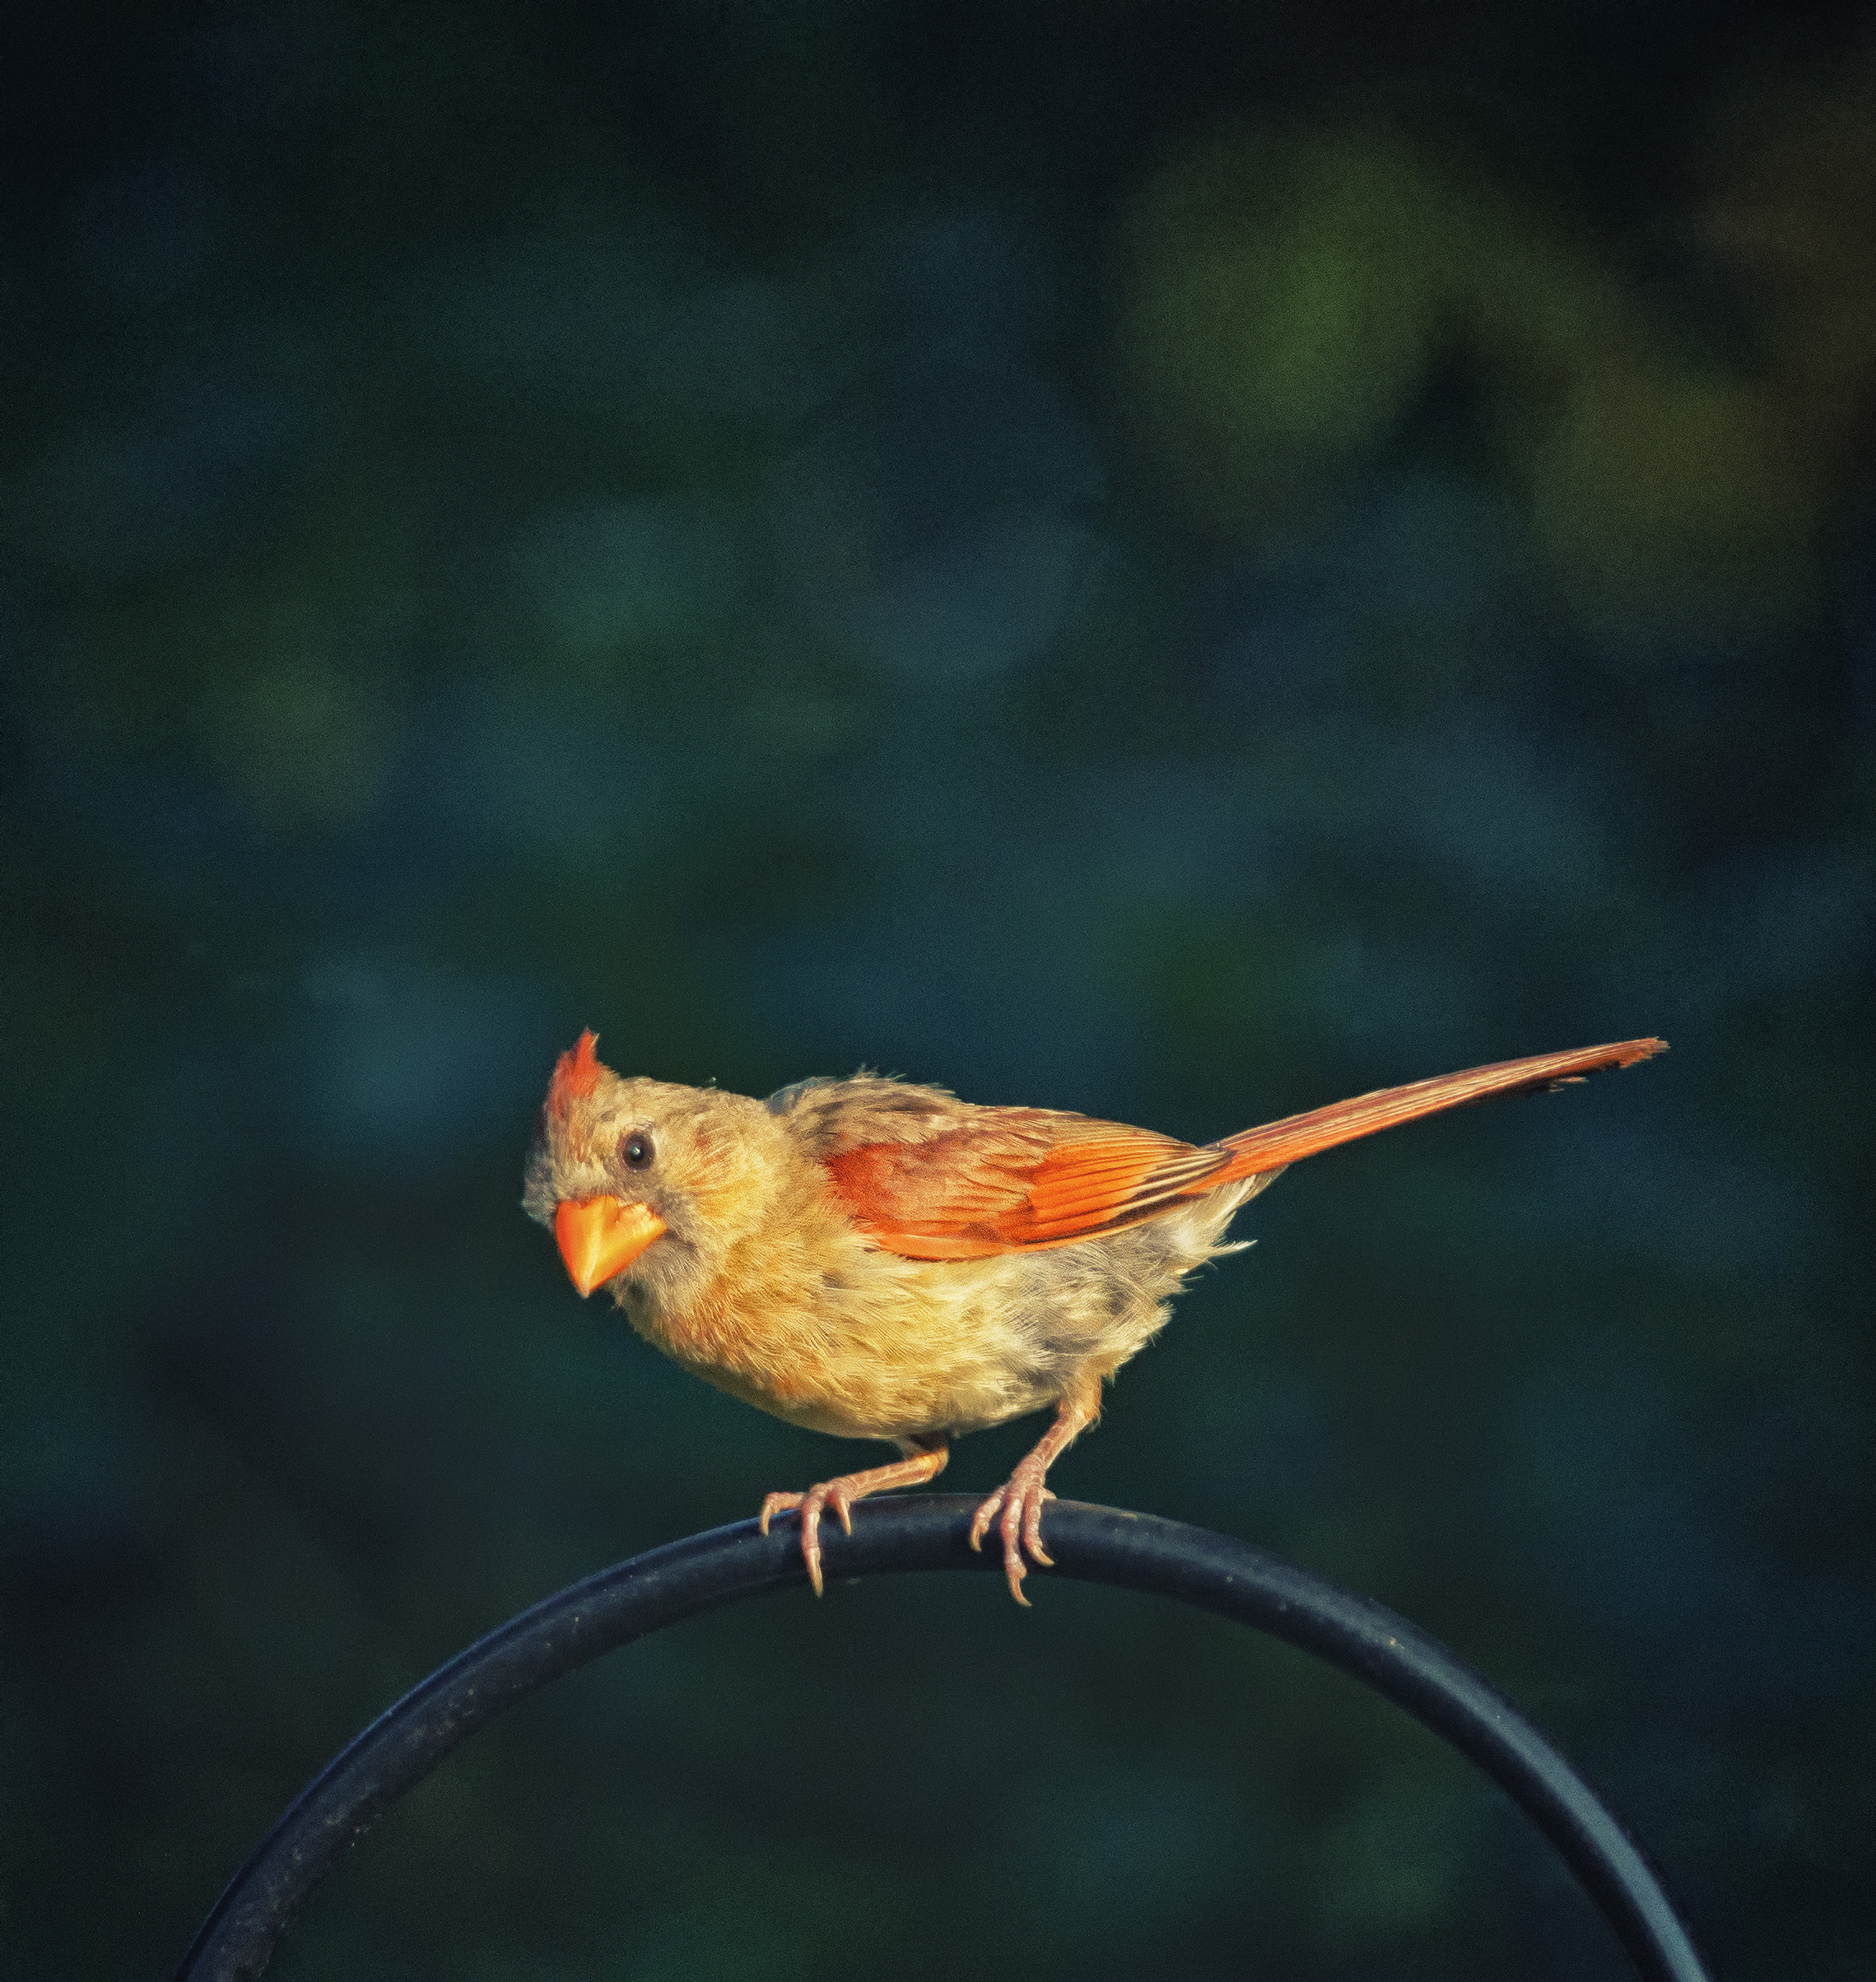 A female cardinal perches on an iron rod.